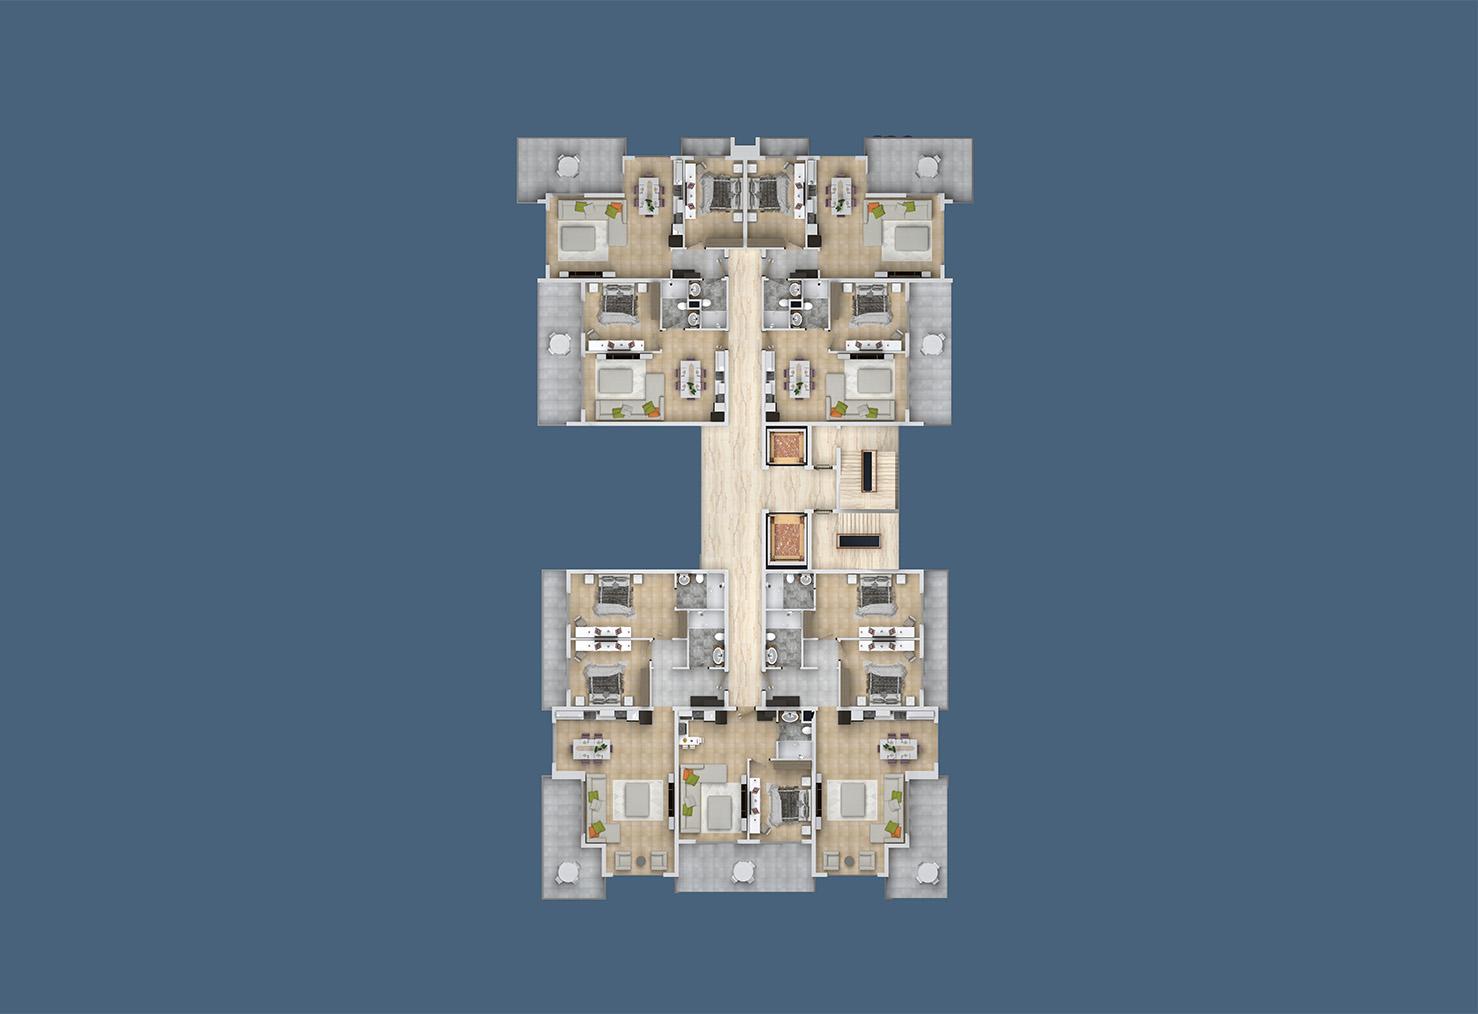 Floor plans of apartments 11 floor «A» Yekta Kingdom Trade Center